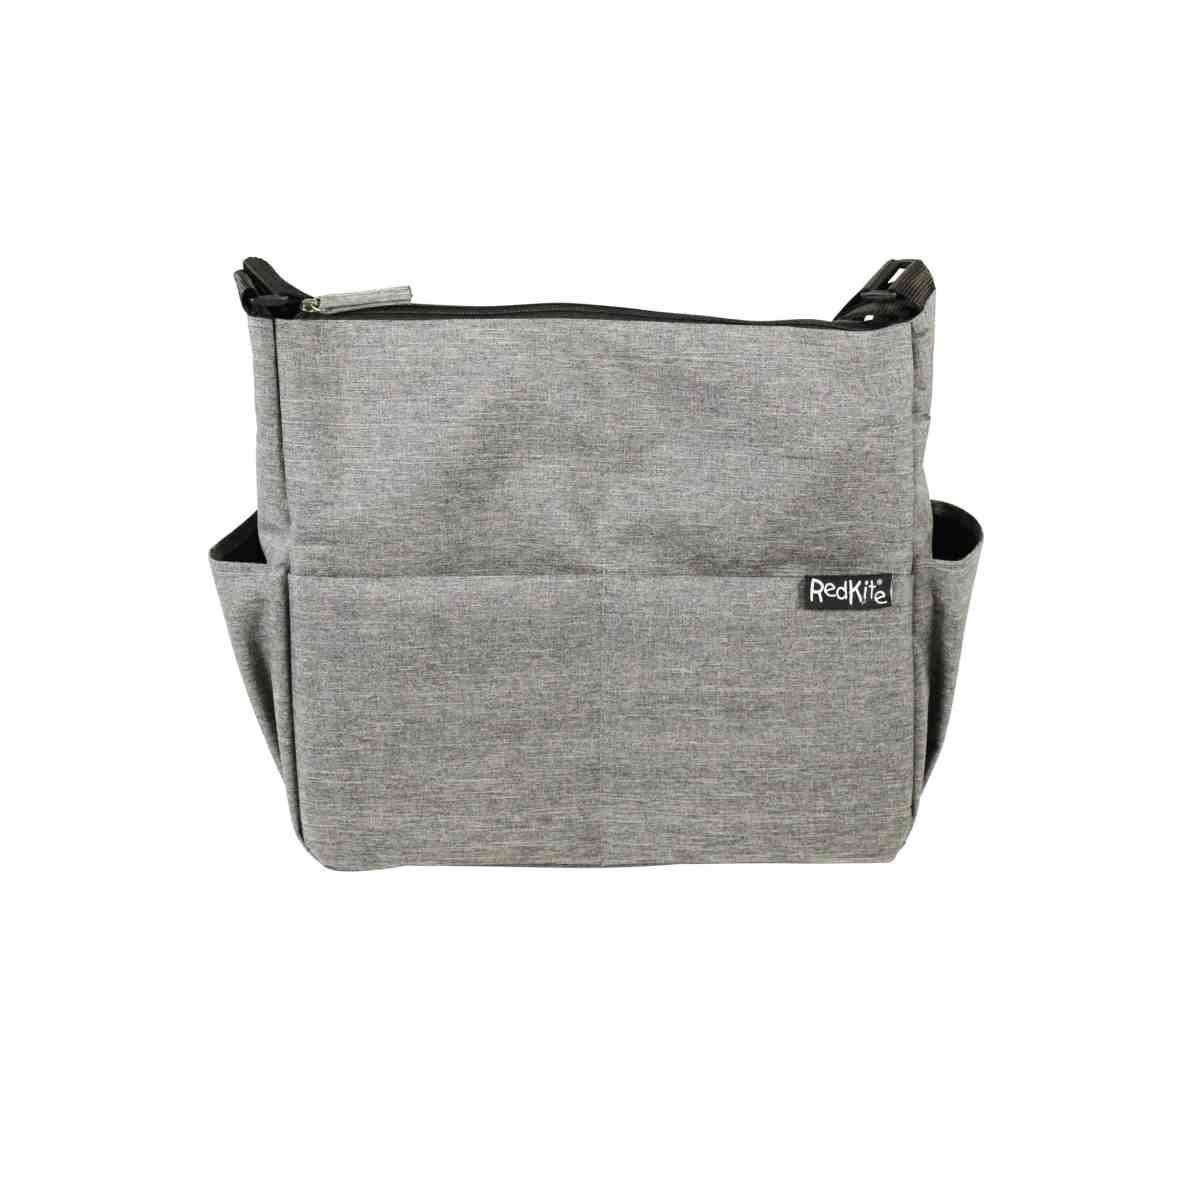 RedKite Change Me Messenger Bag Including Changing Mat – Grey